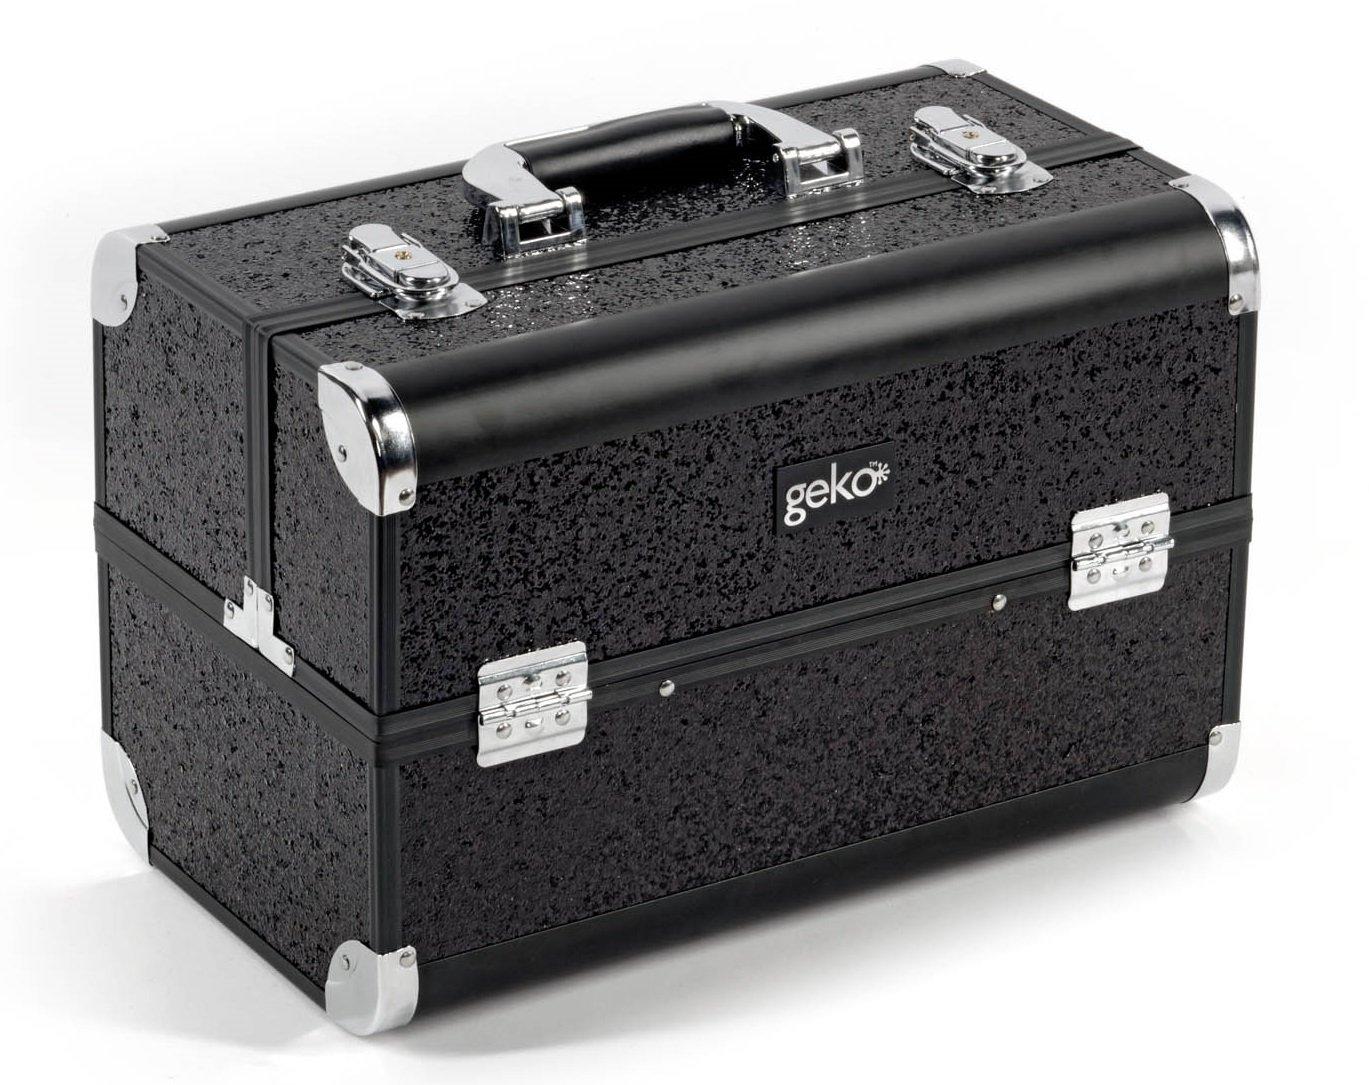 GEKO 1-Piece Vanity Case/Makeup Box, Black Glitter